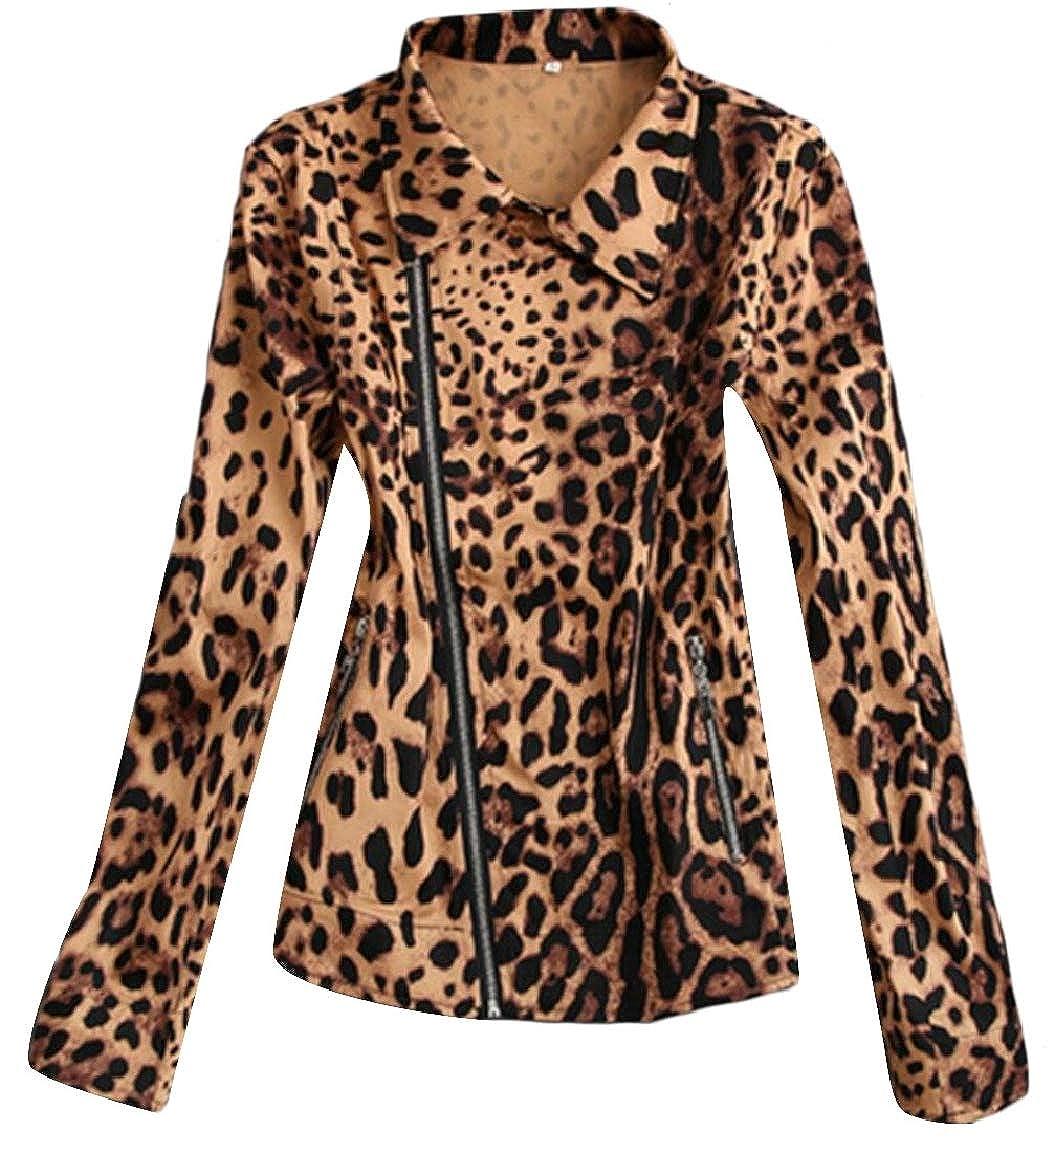 Yellow LEISHOP Women Casual Slim Fit Leopard Zipper Stylish Punk Jackets